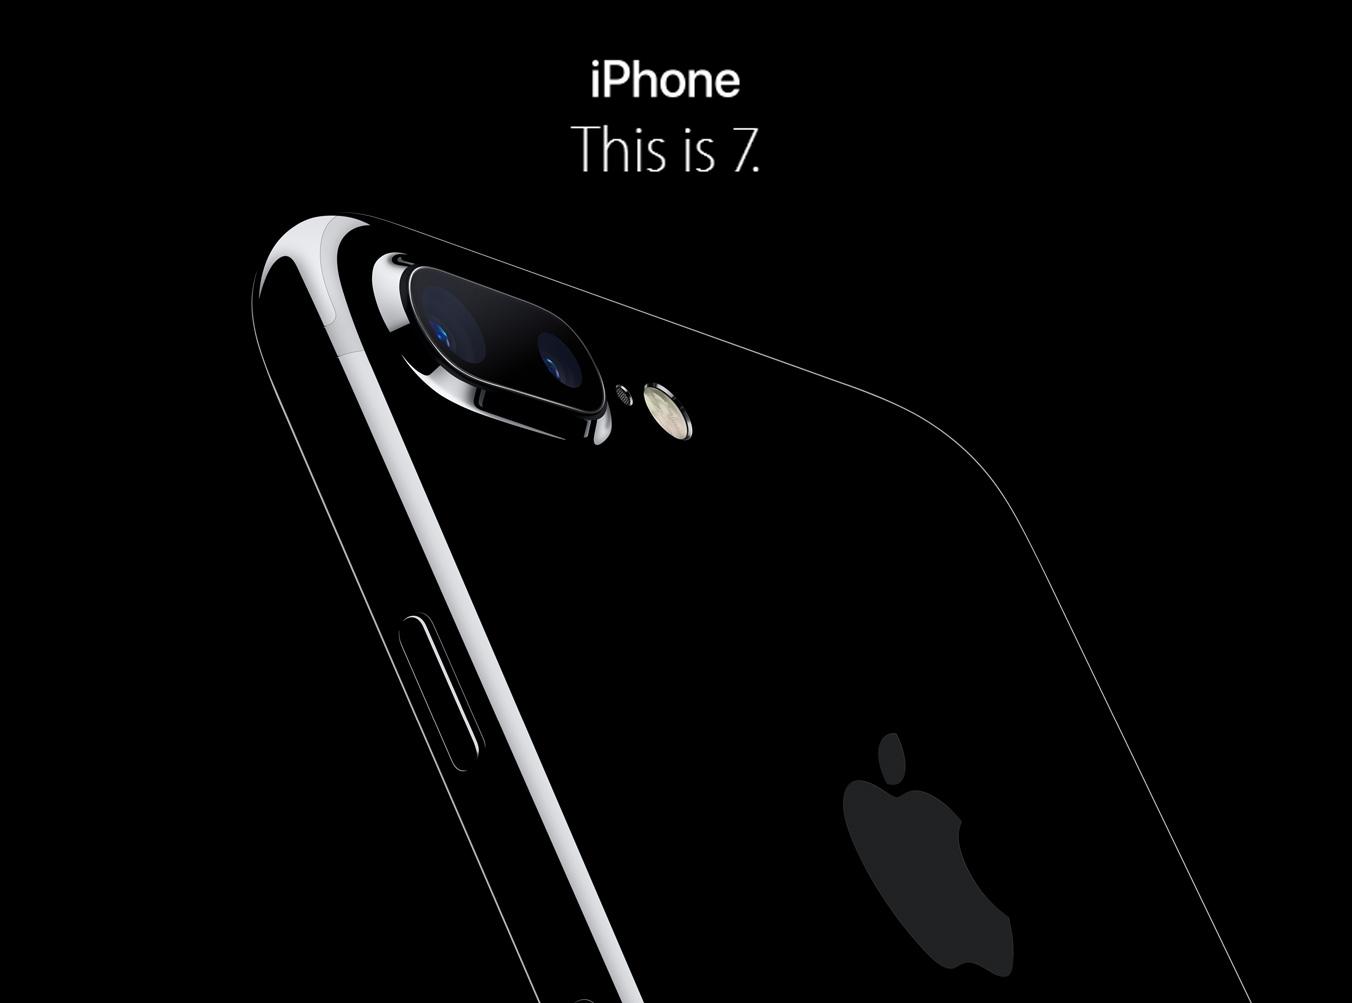 iphone_large